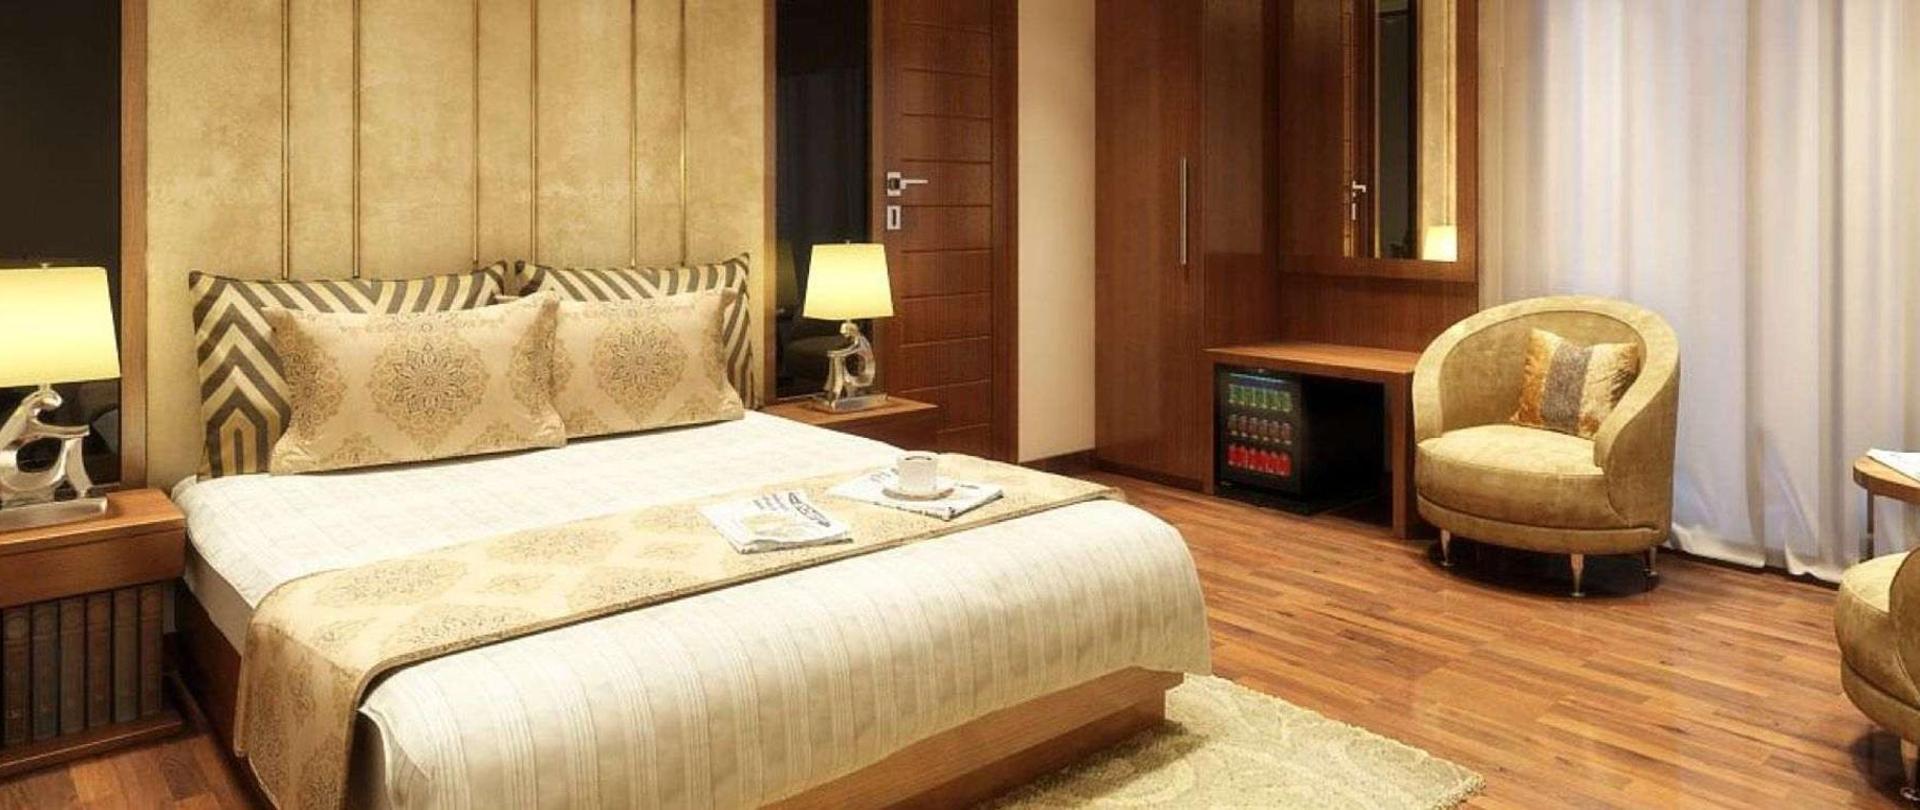 grand-ffour-room-1.jpg